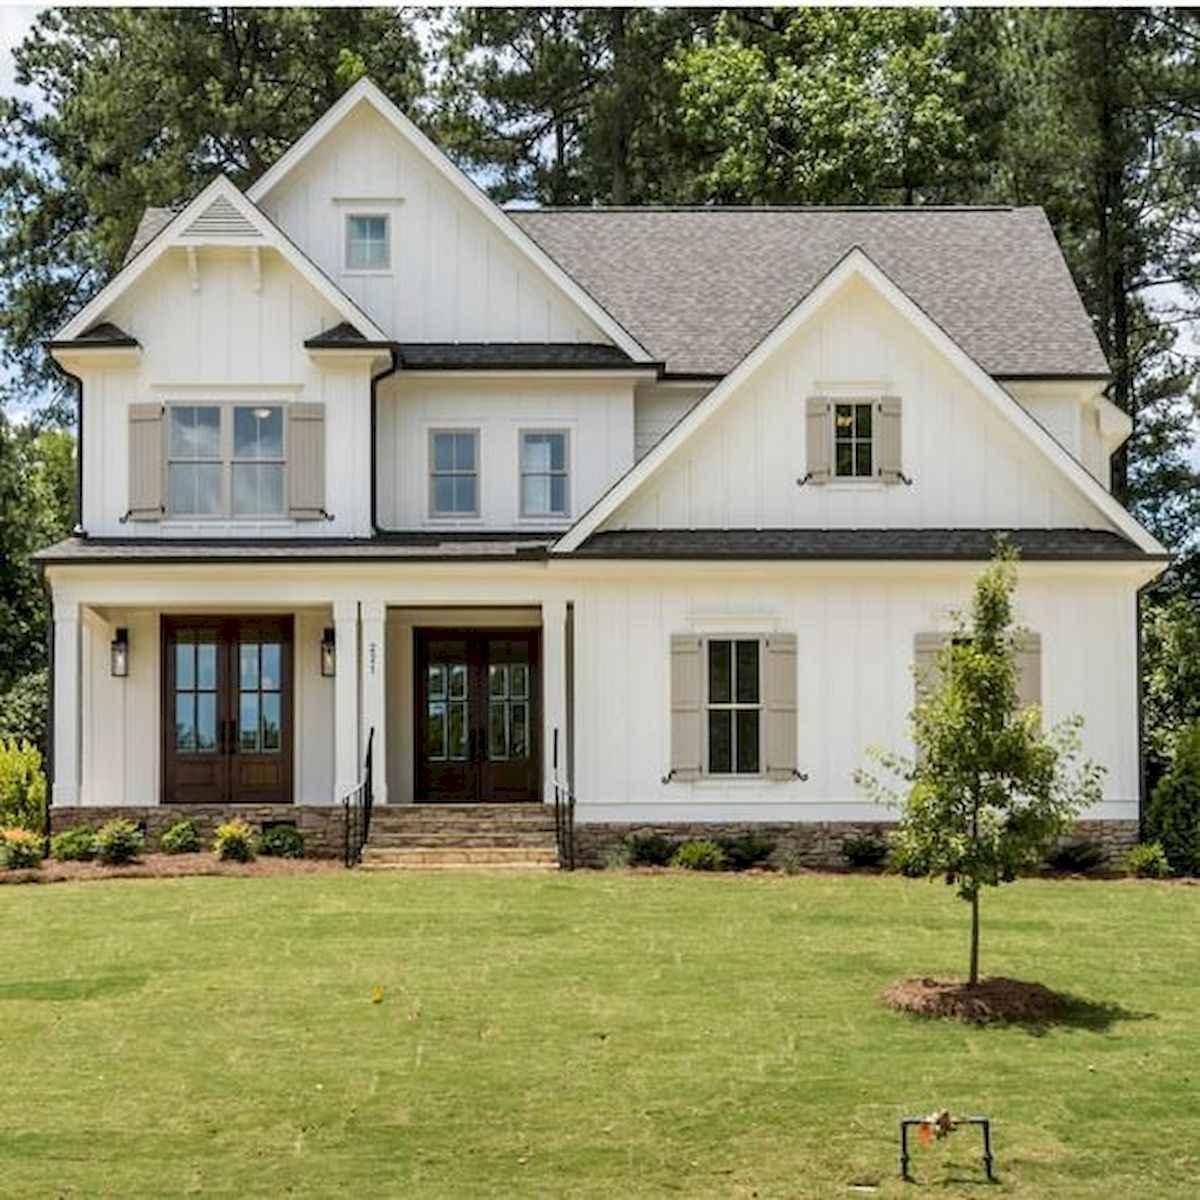 33 Best Modern Farmhouse Exterior Design Ideas - LivingMarch.com